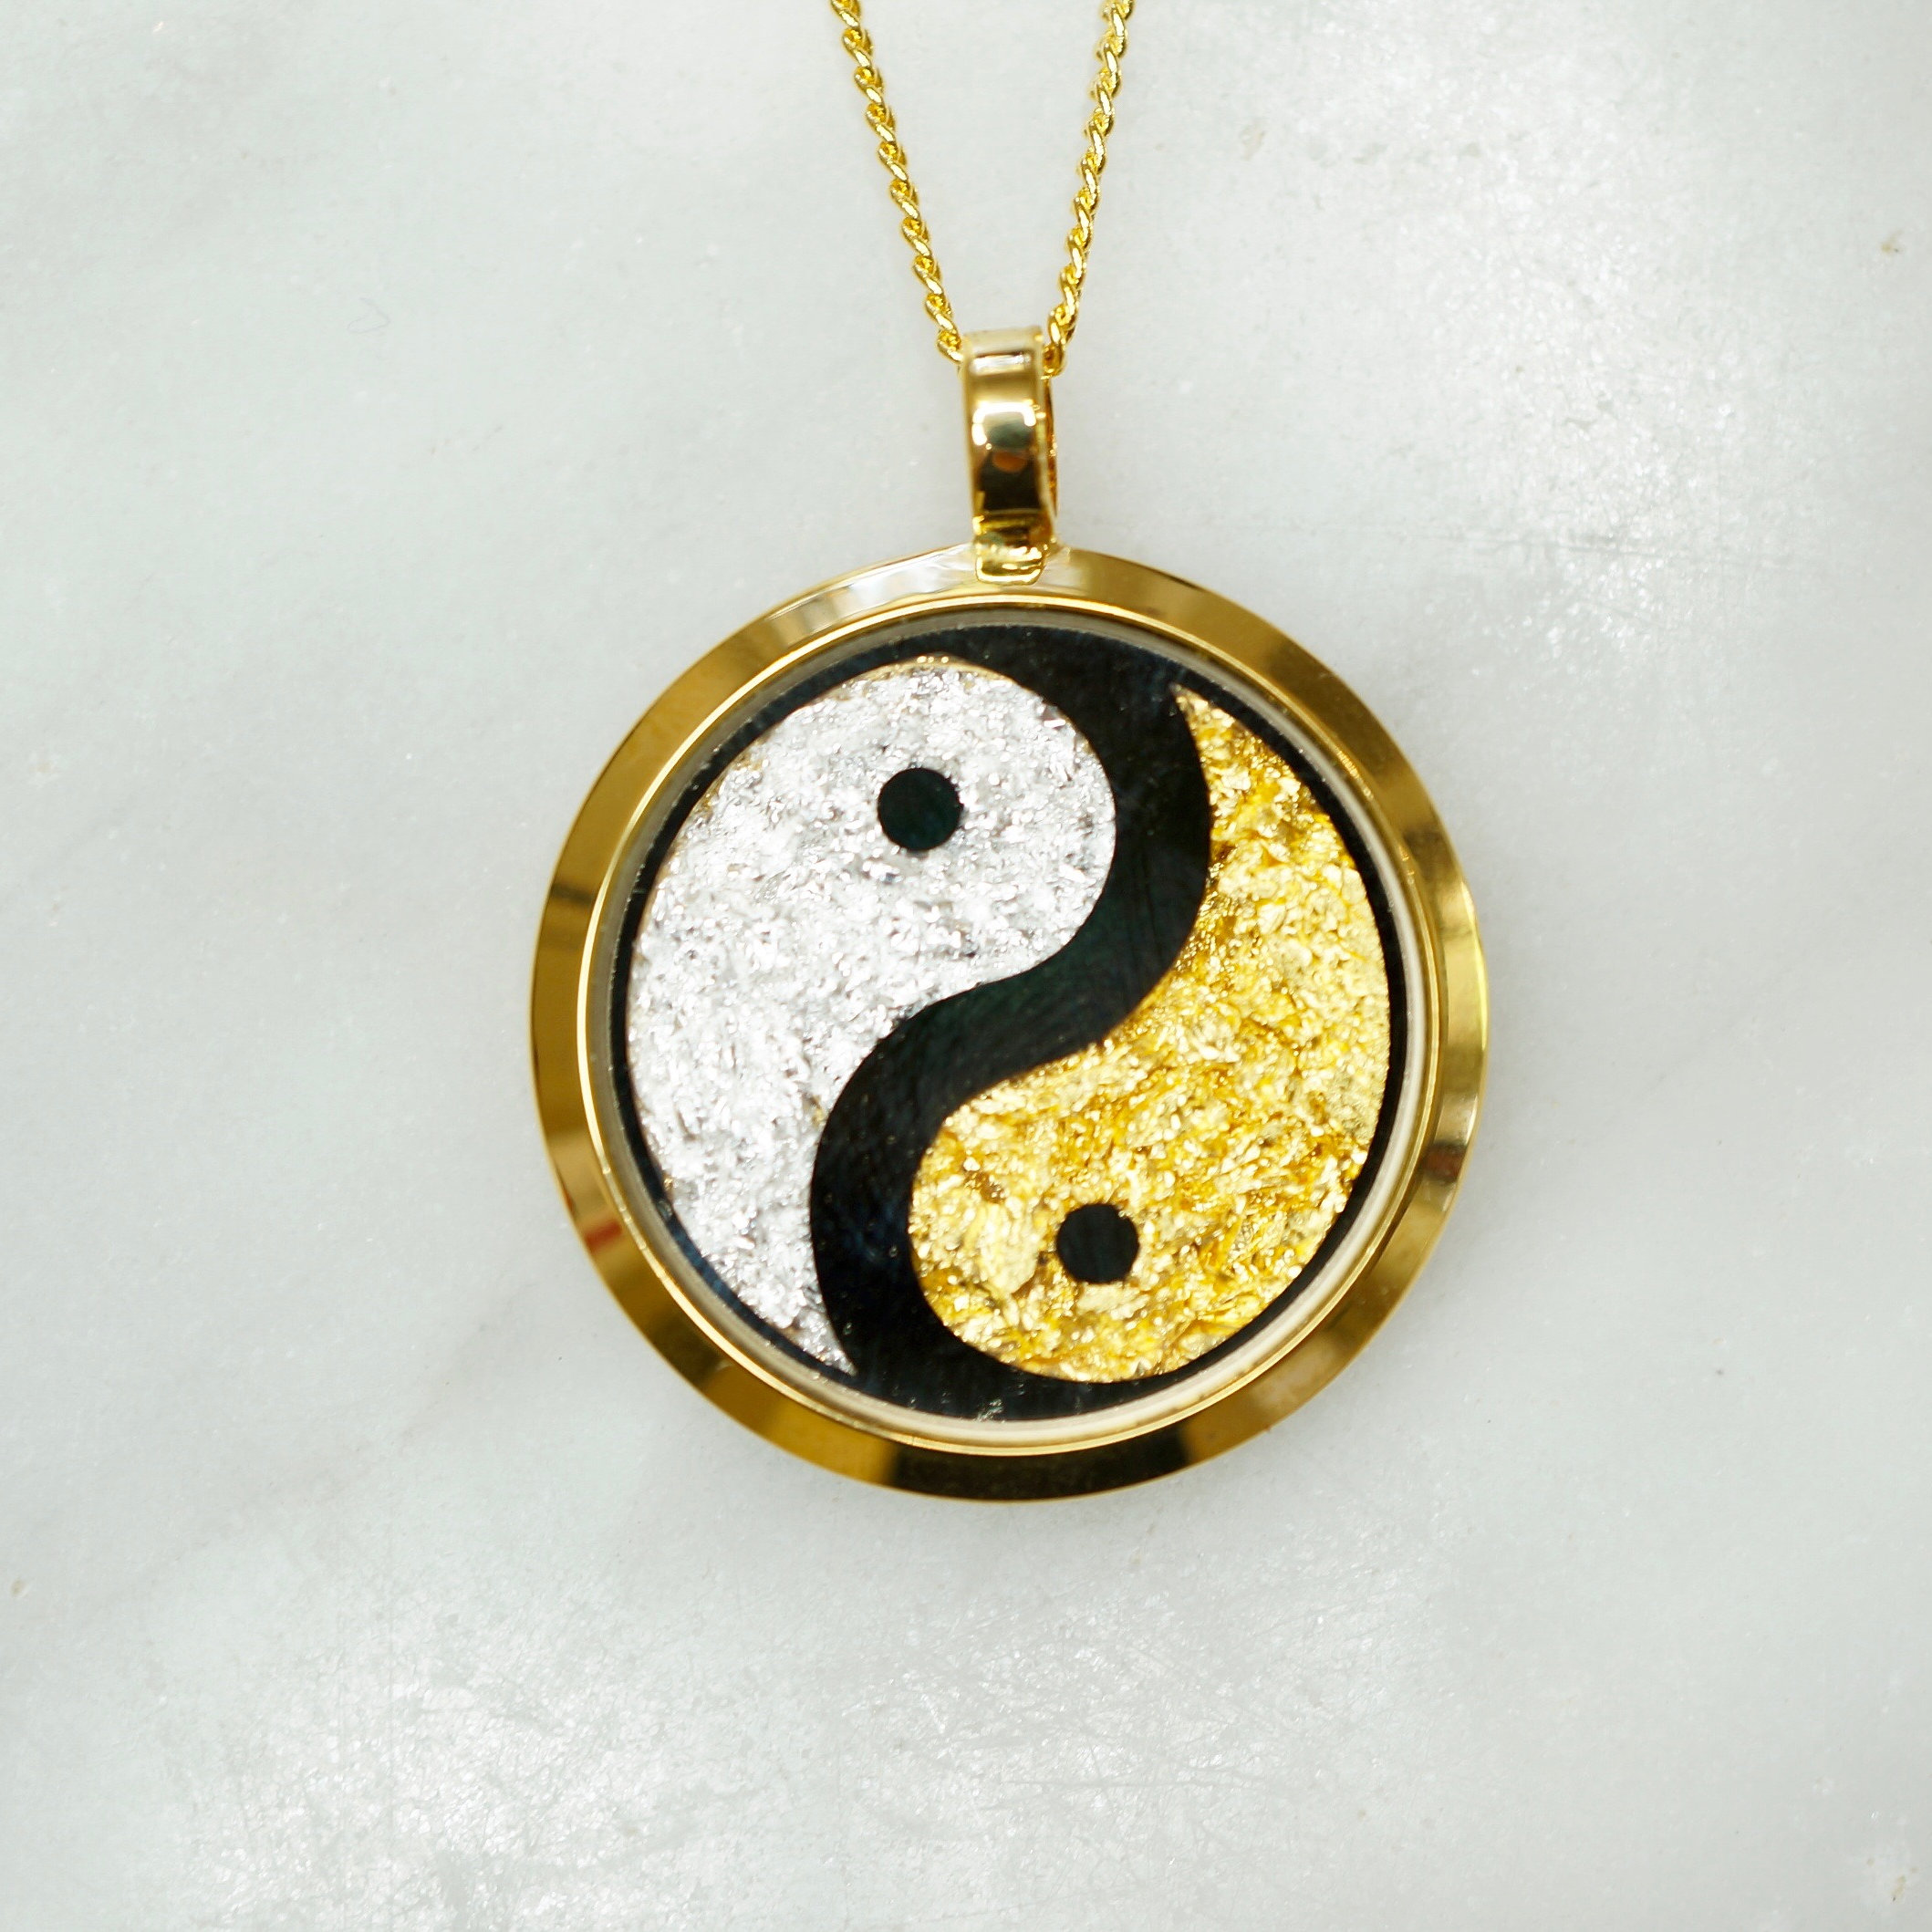 Beechworth gold gold leaf small yin yang pendant gold leaf small yin yang pendant aloadofball Choice Image